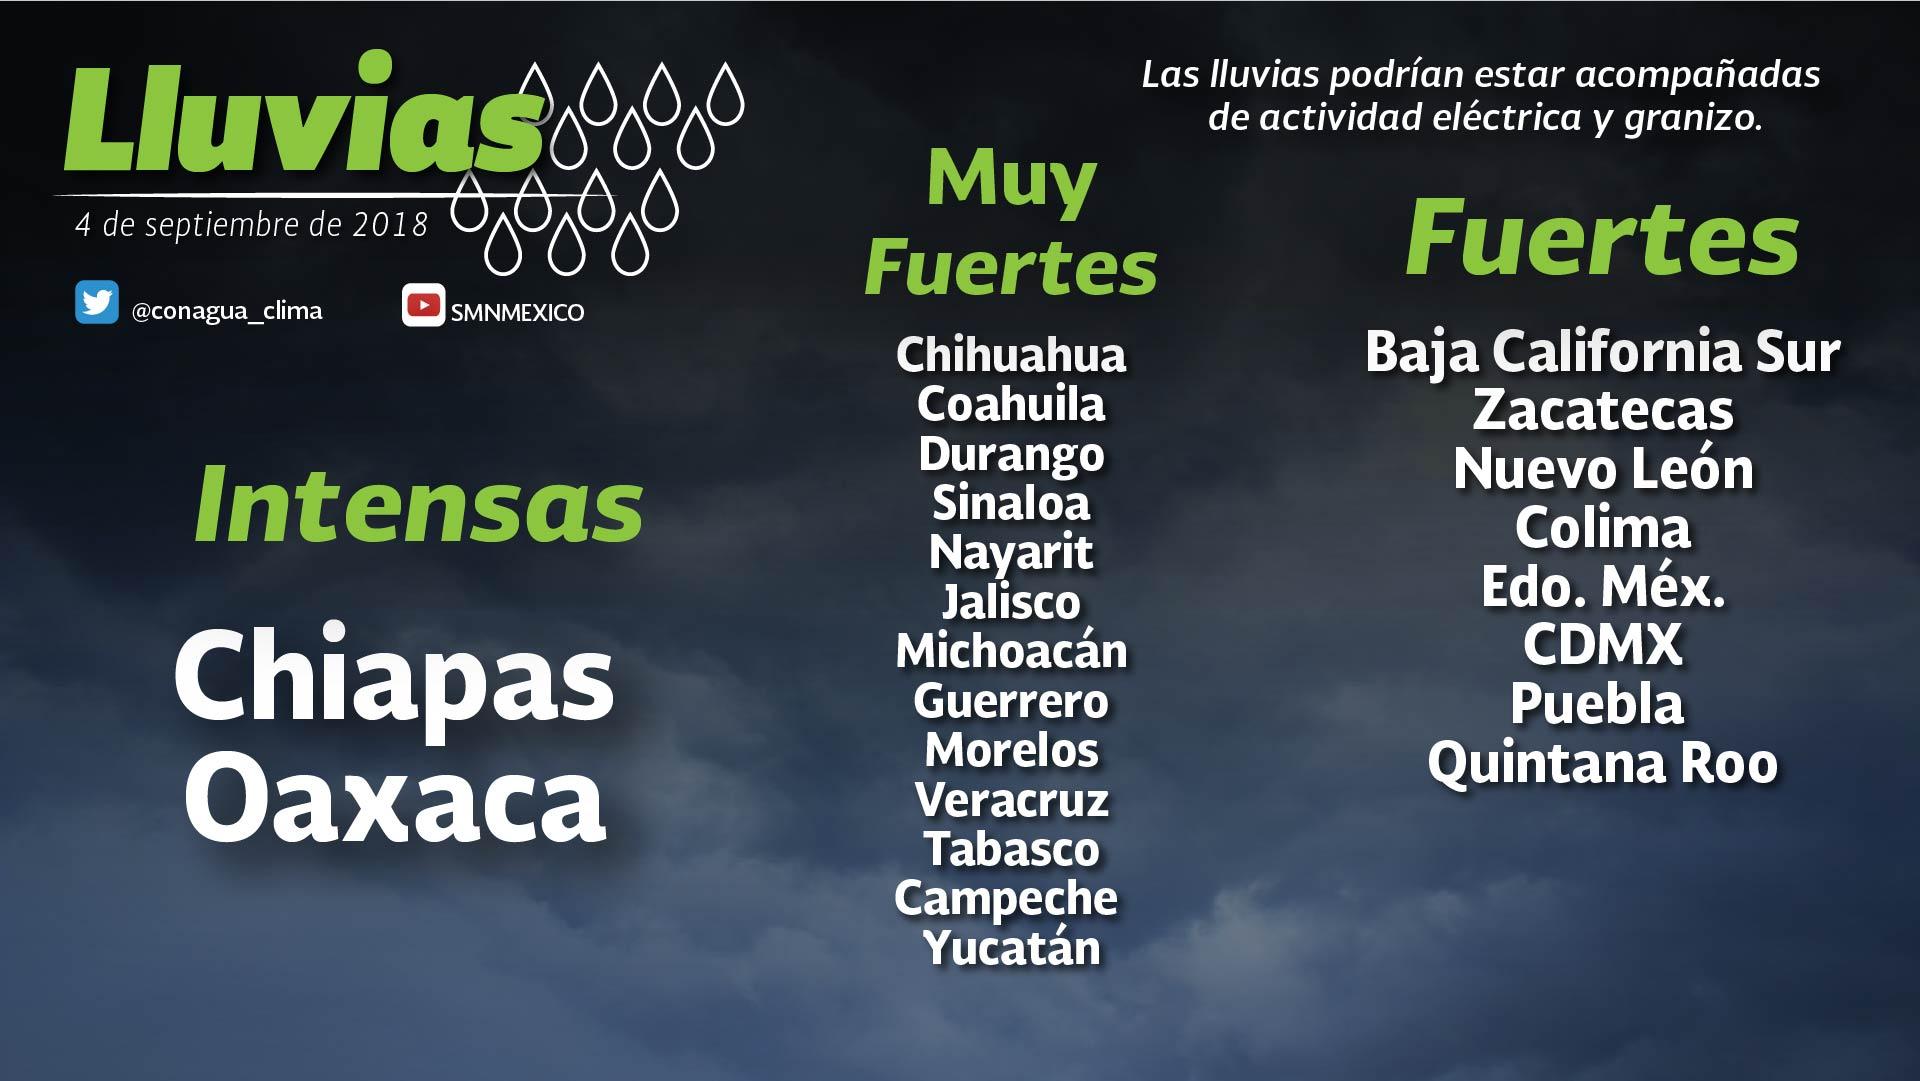 Persiste el pronóstico de  lluvias con intervalos de chubascos para Tlaxcala